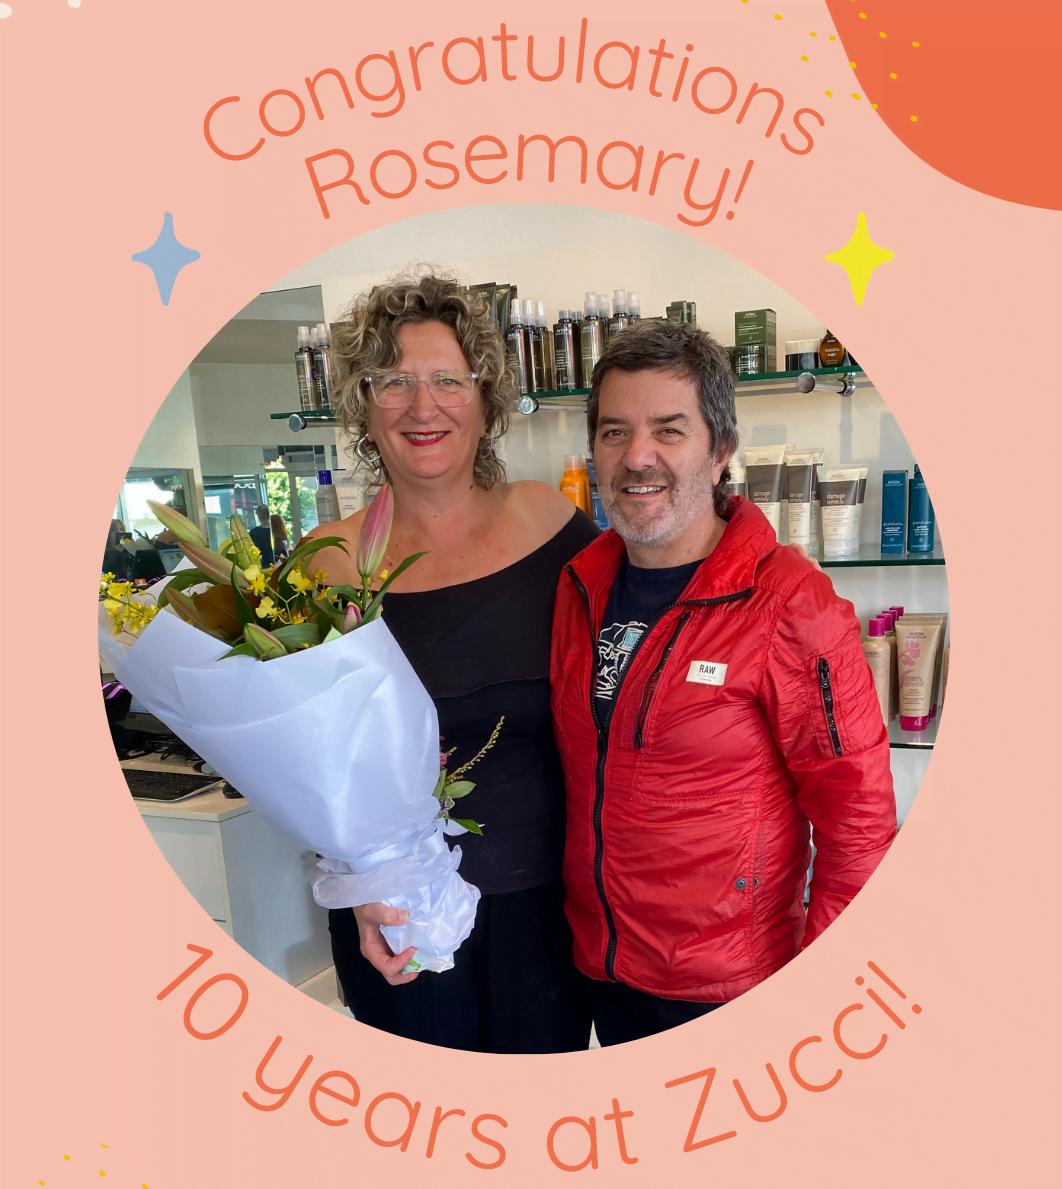 Congrats Rose